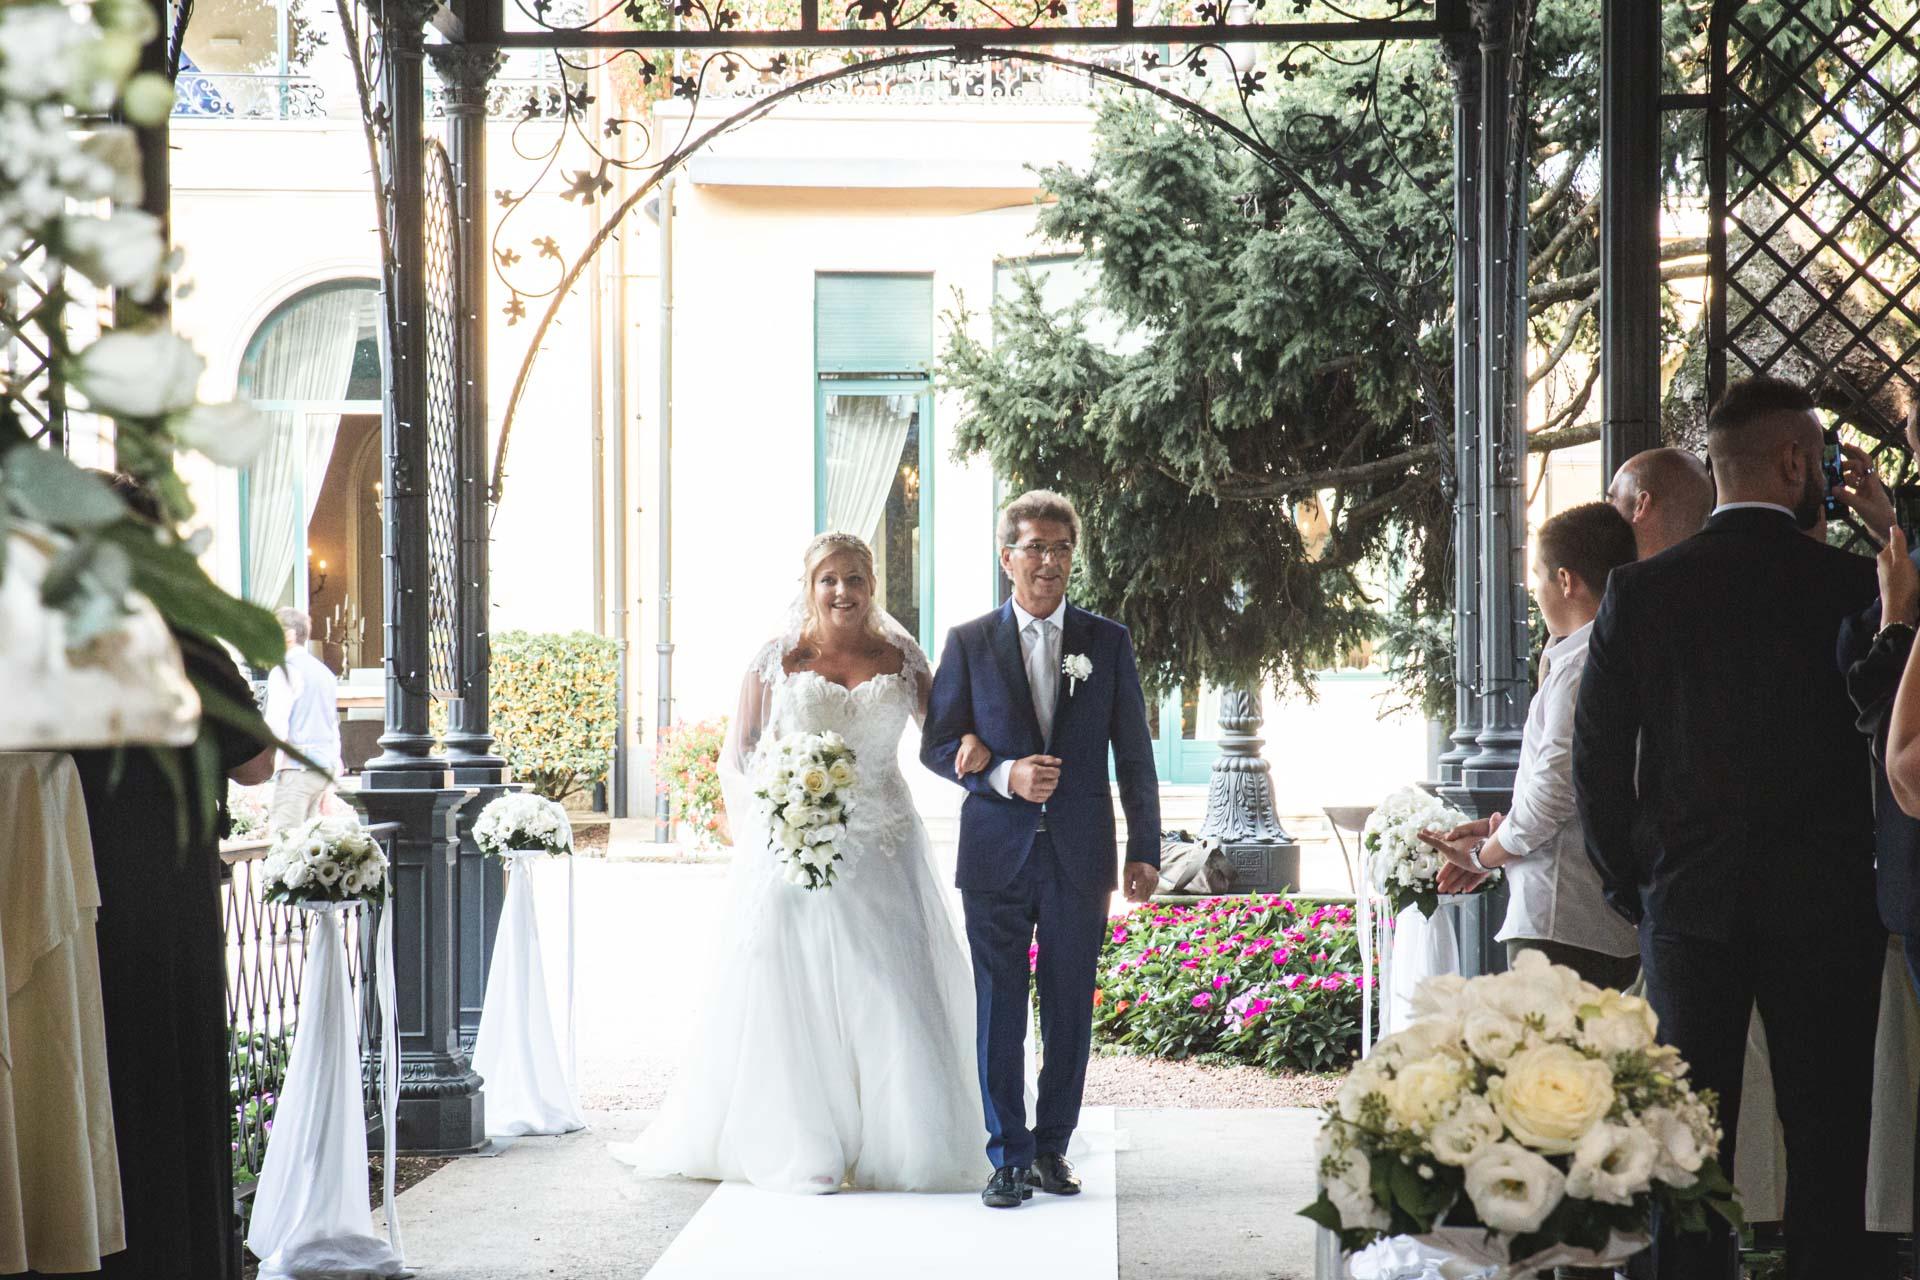 ingresso sposa papà celebrazione invitati